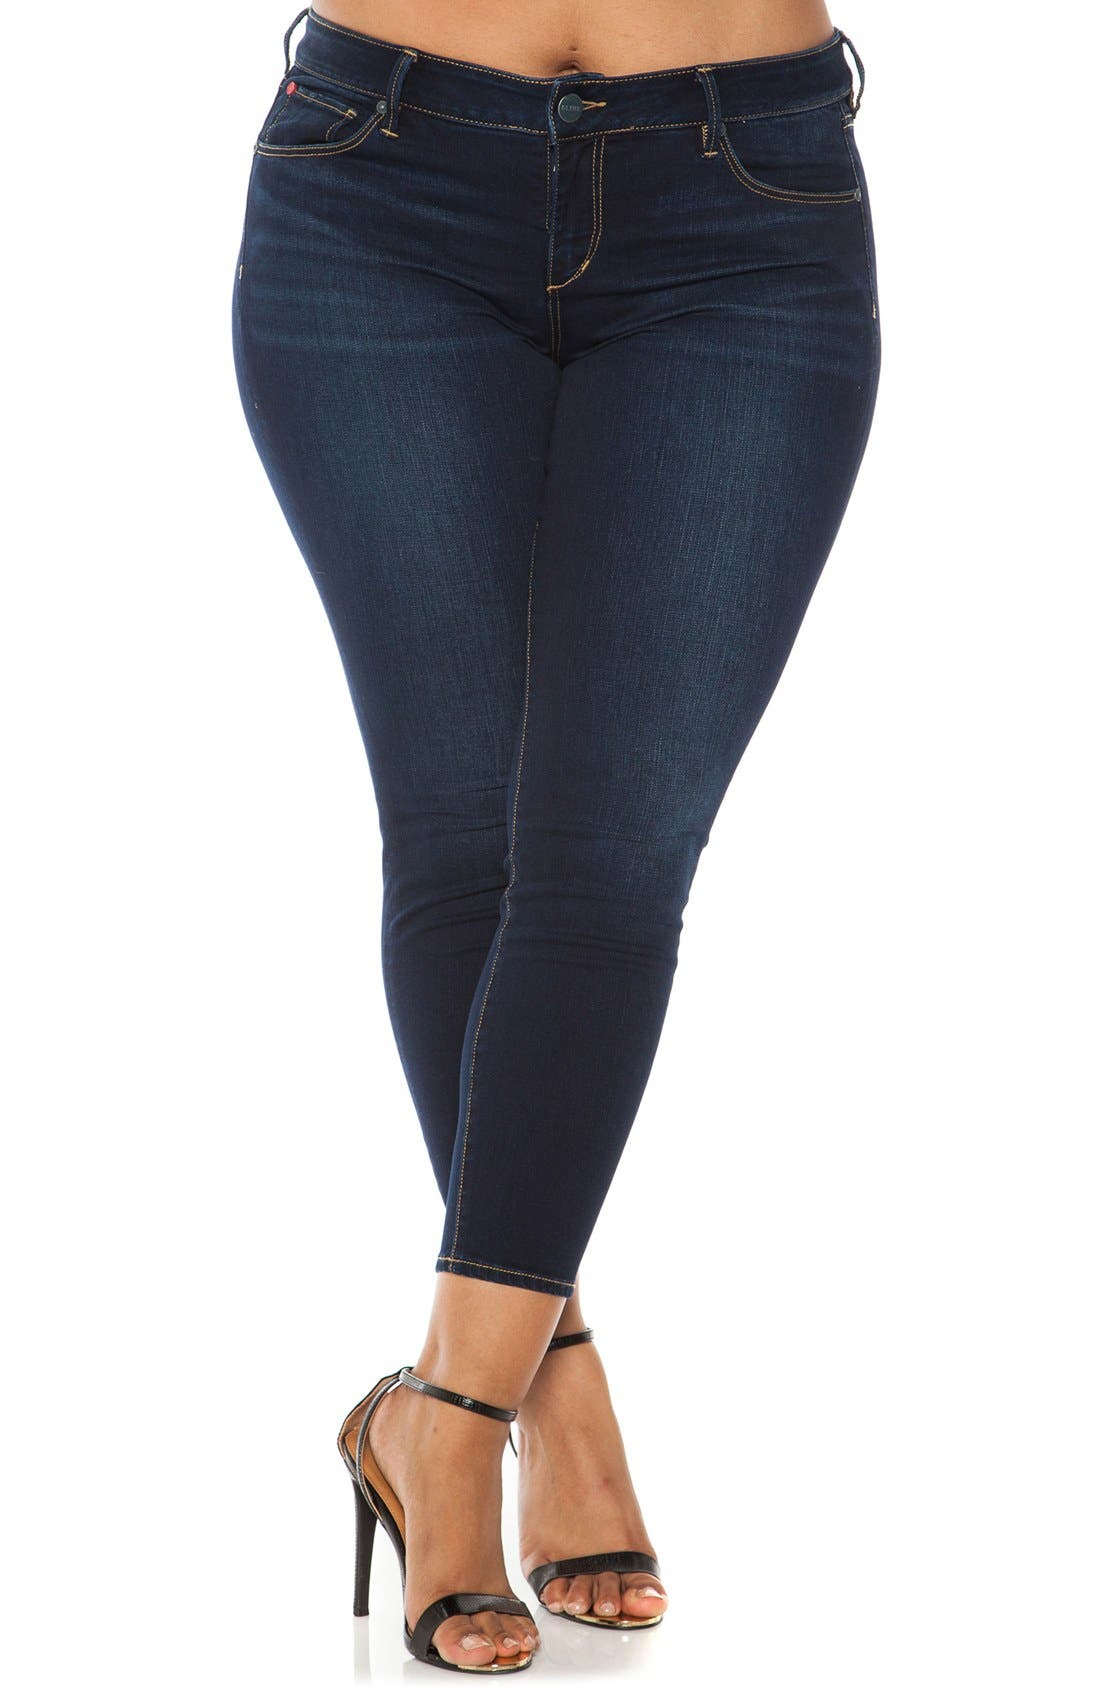 SLINK Jeans Stretch Ankle Skinny Jeans (Plus Size) | Nordstrom